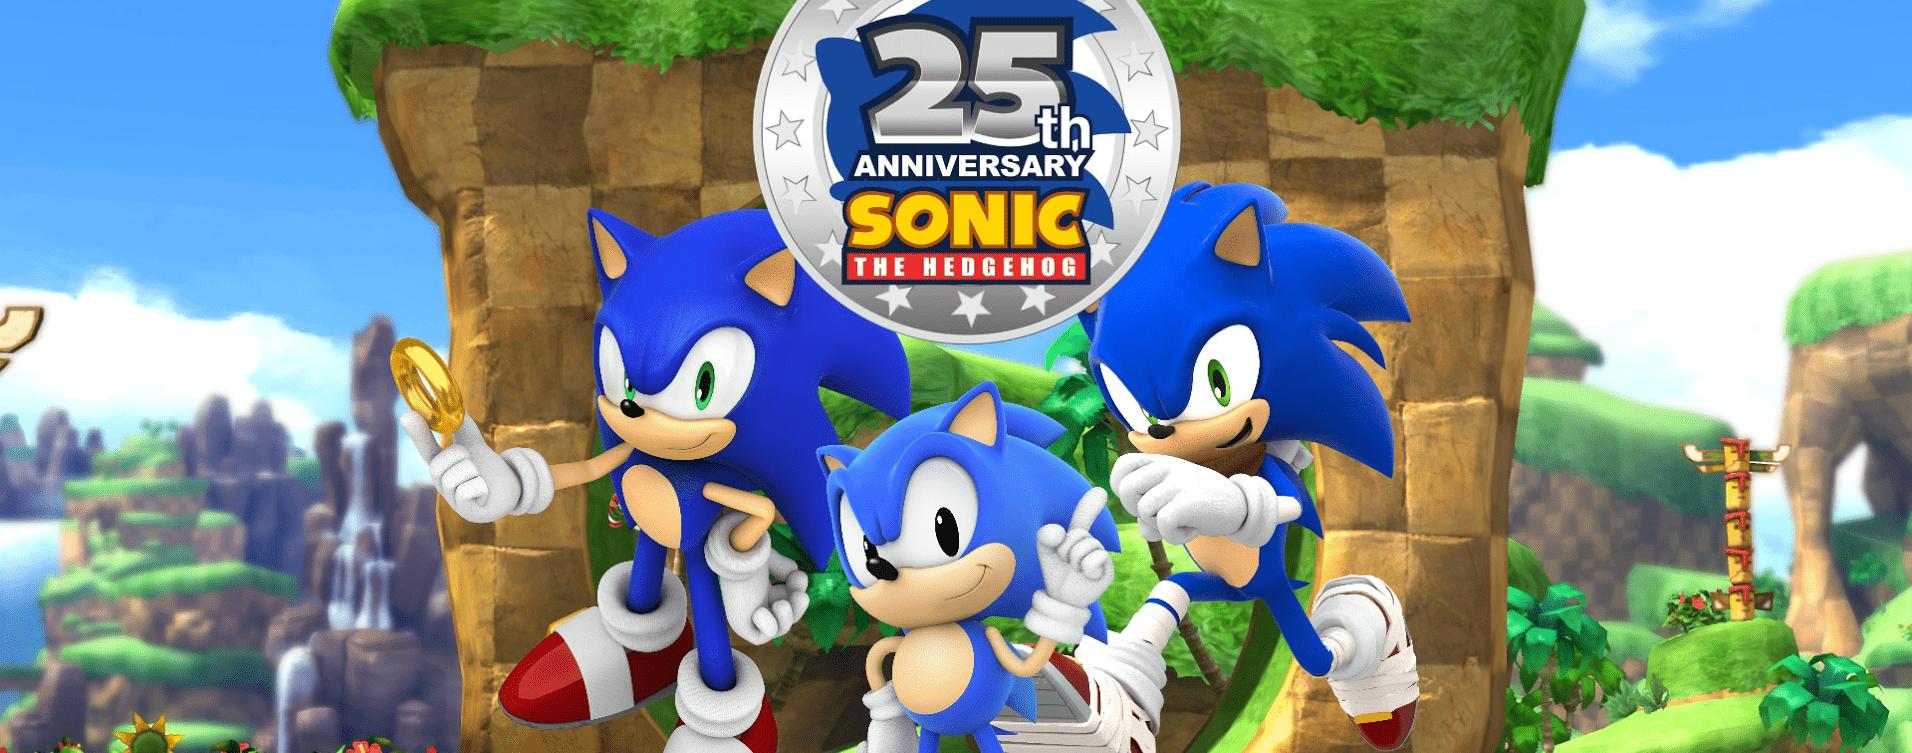 Sonic News My Geek Actu 2.png